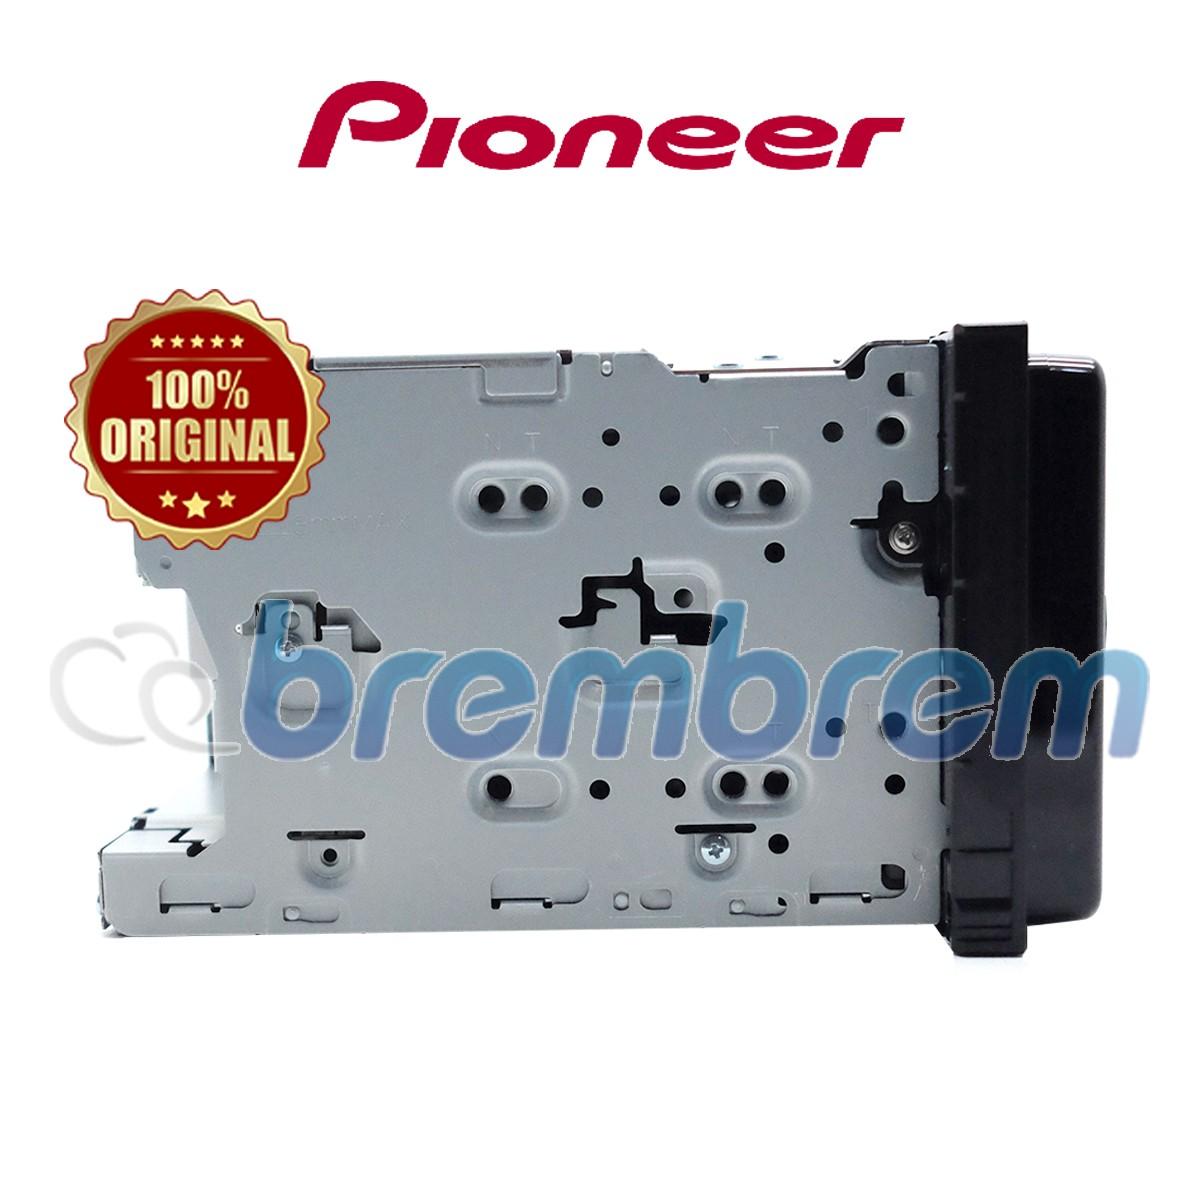 PIONEER AVH-ZL5150BT - HEADUNIT DOUBLE DIN